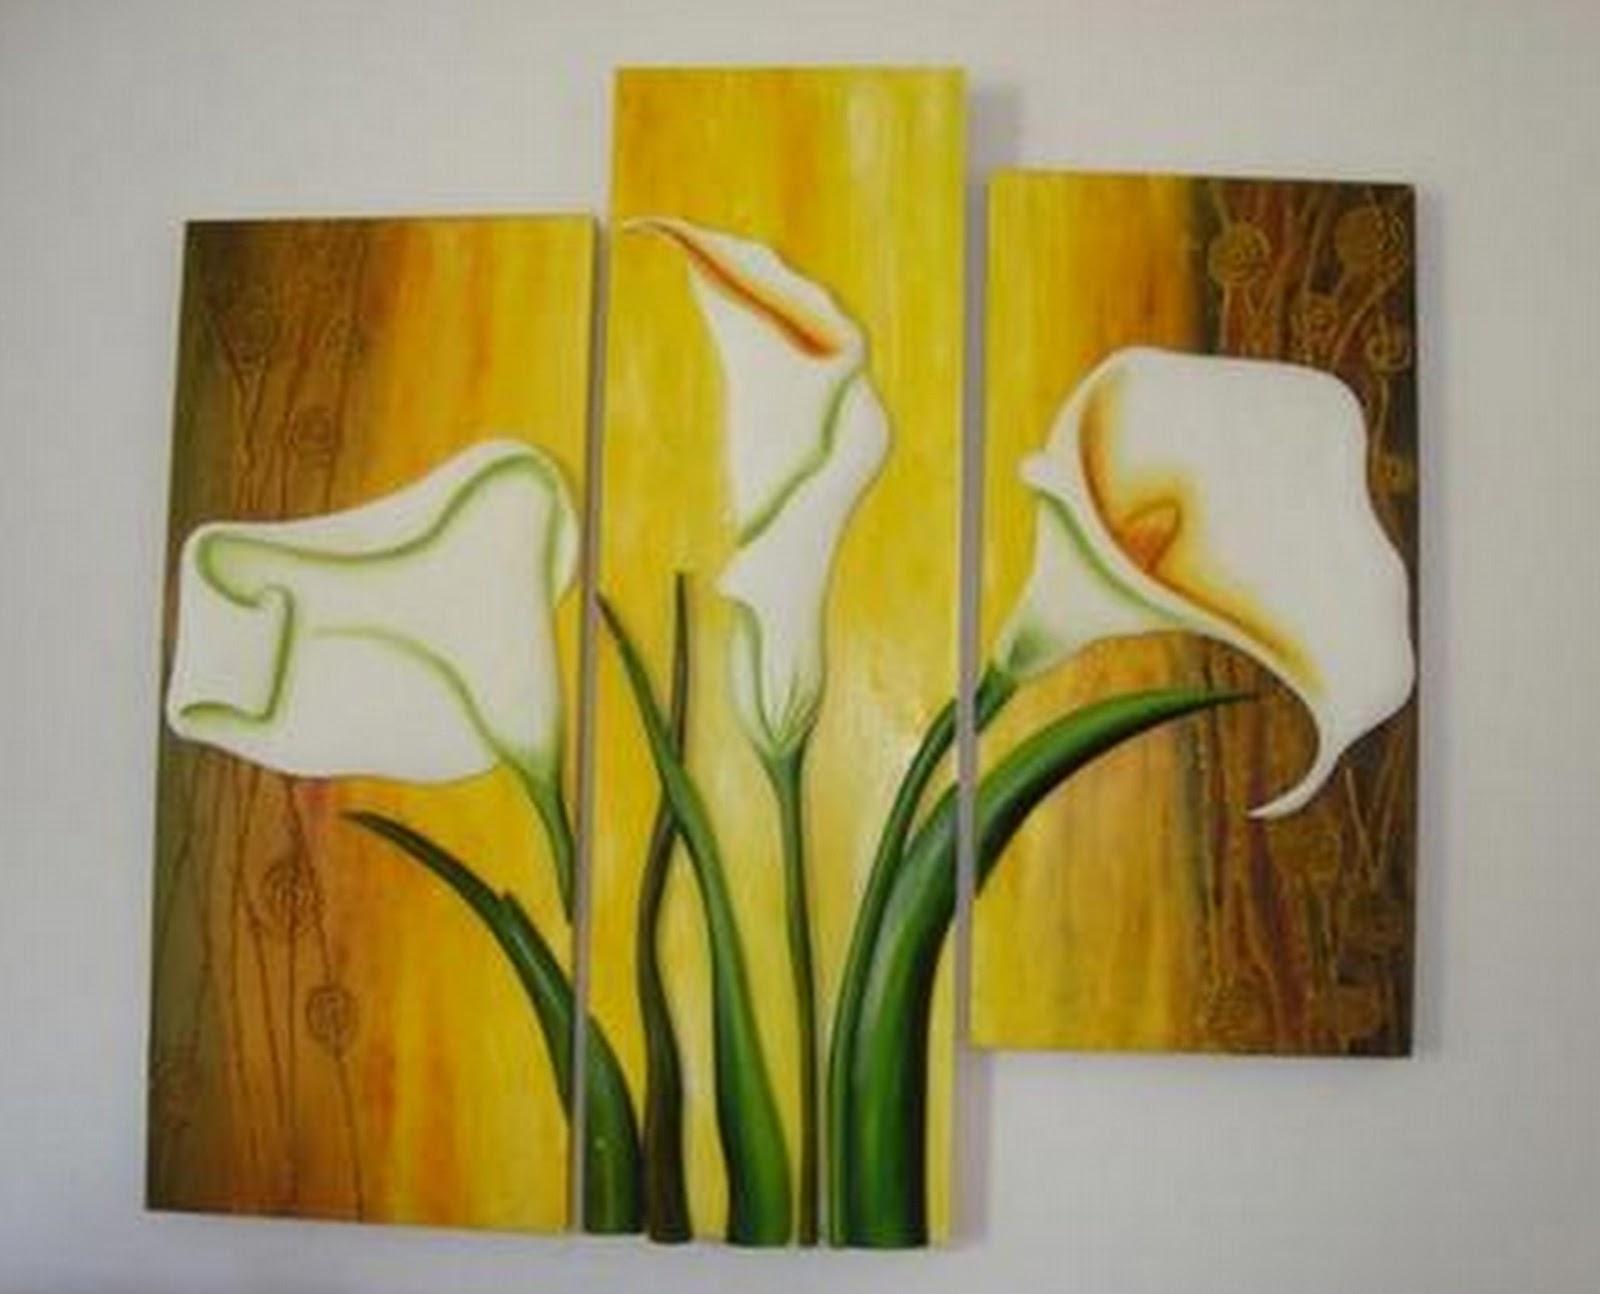 Pinturas cuadros lienzos pinturas tripticos modernos con - Triptico cuadros modernos ...